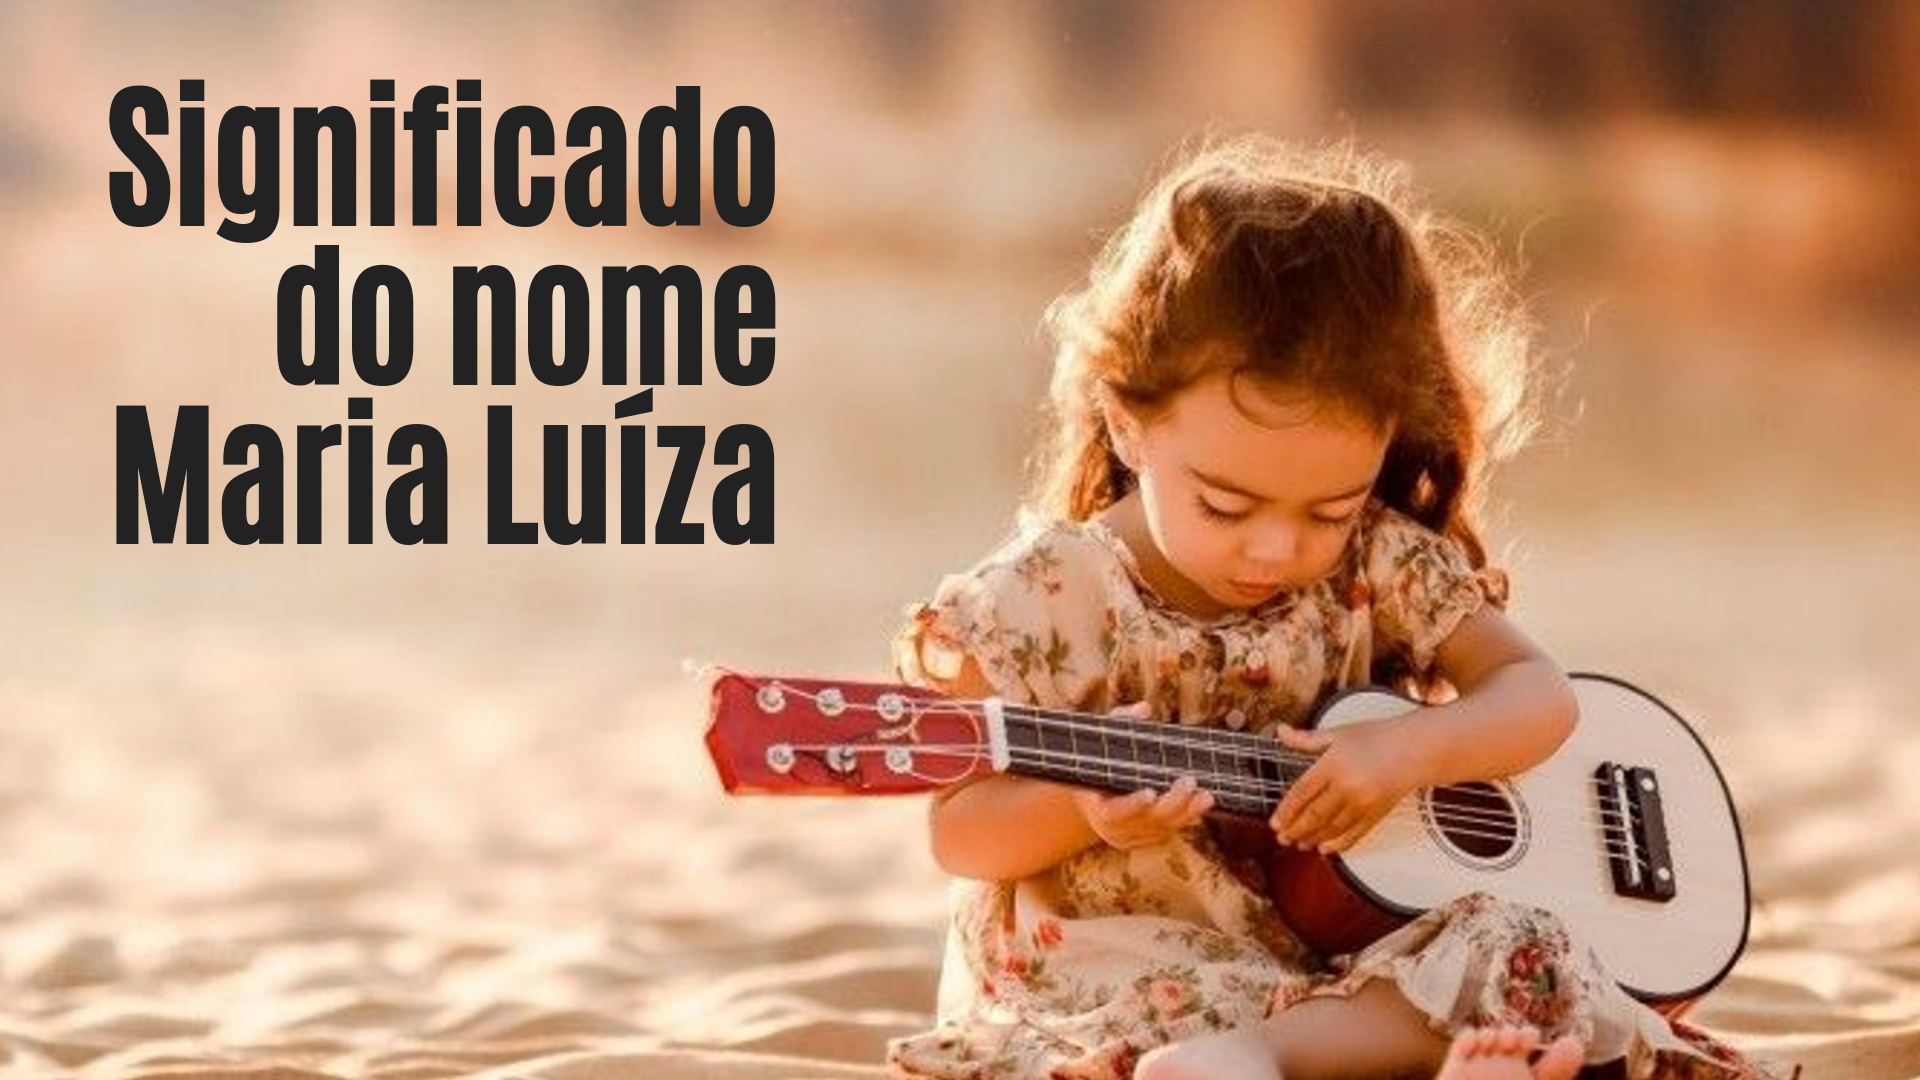 foto escrita significado do nome Maria Luiza